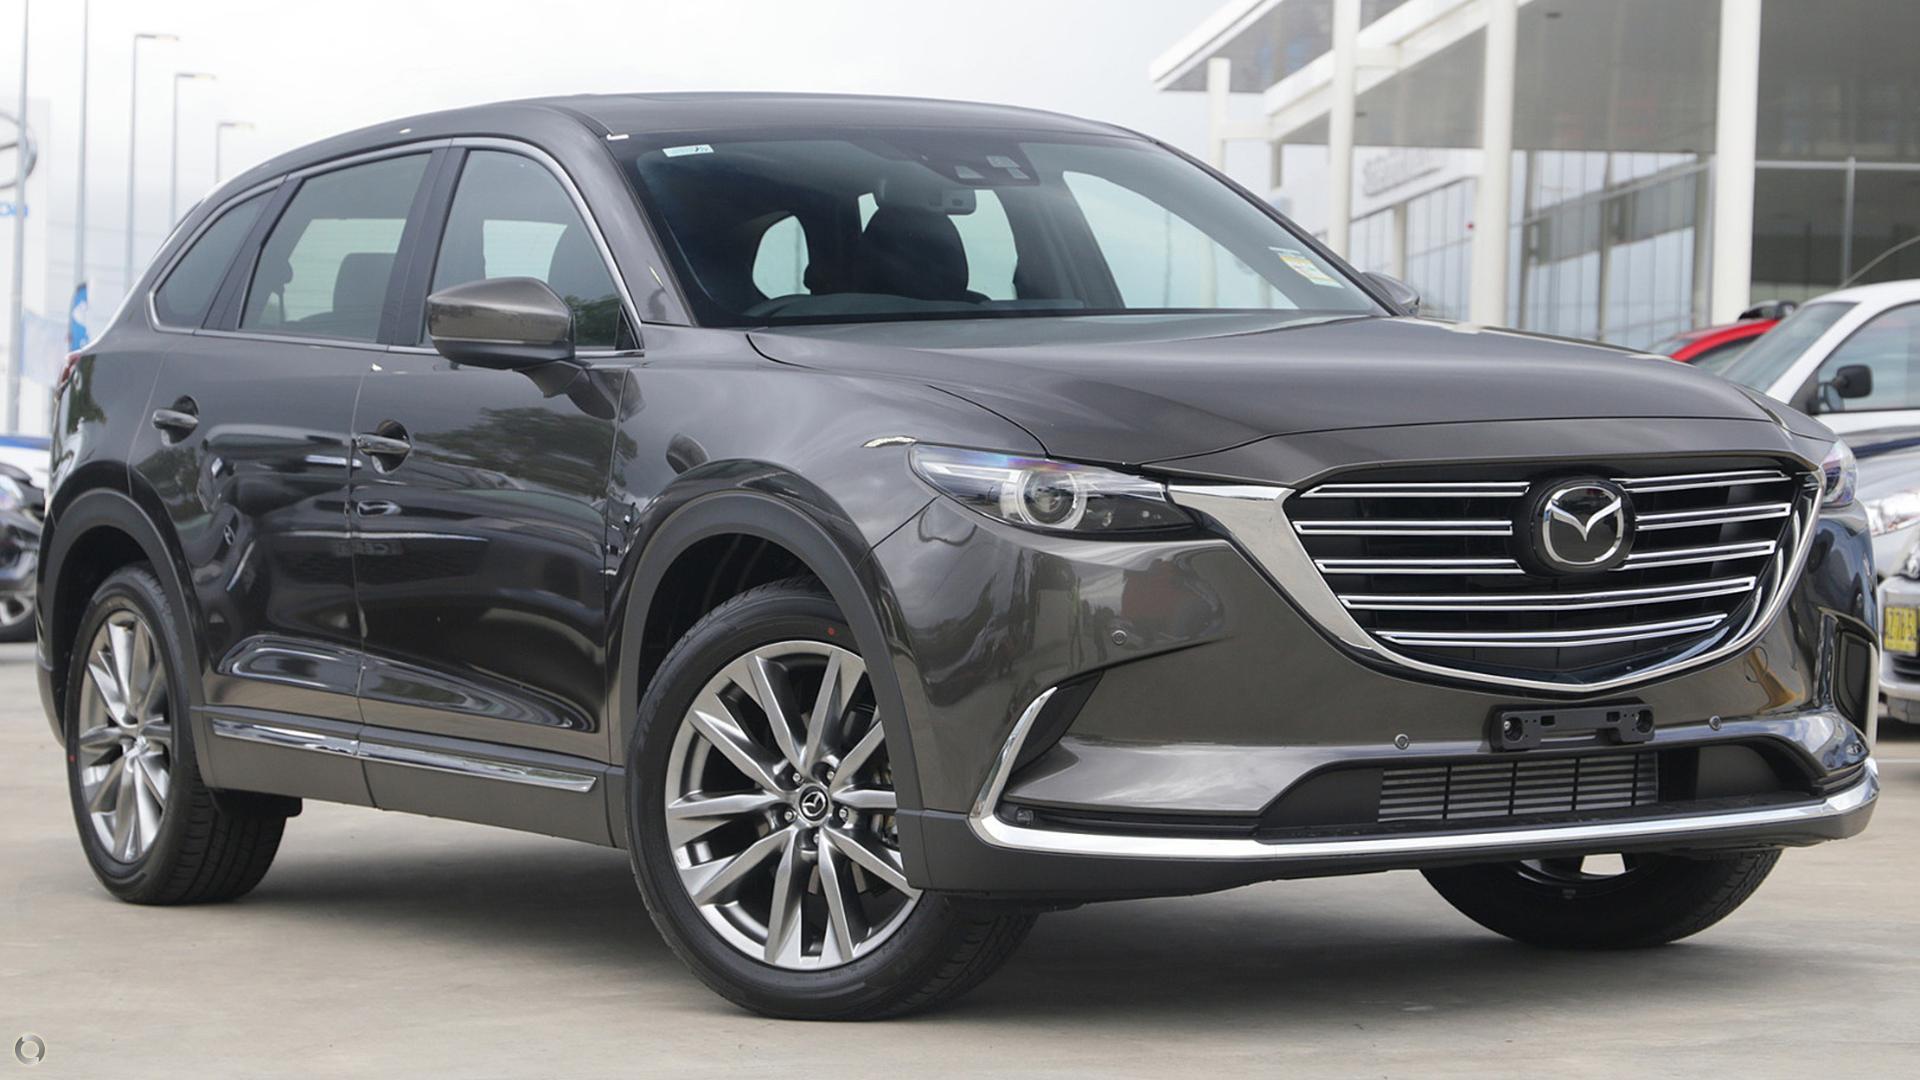 2017 Mazda Cx-9 Azami